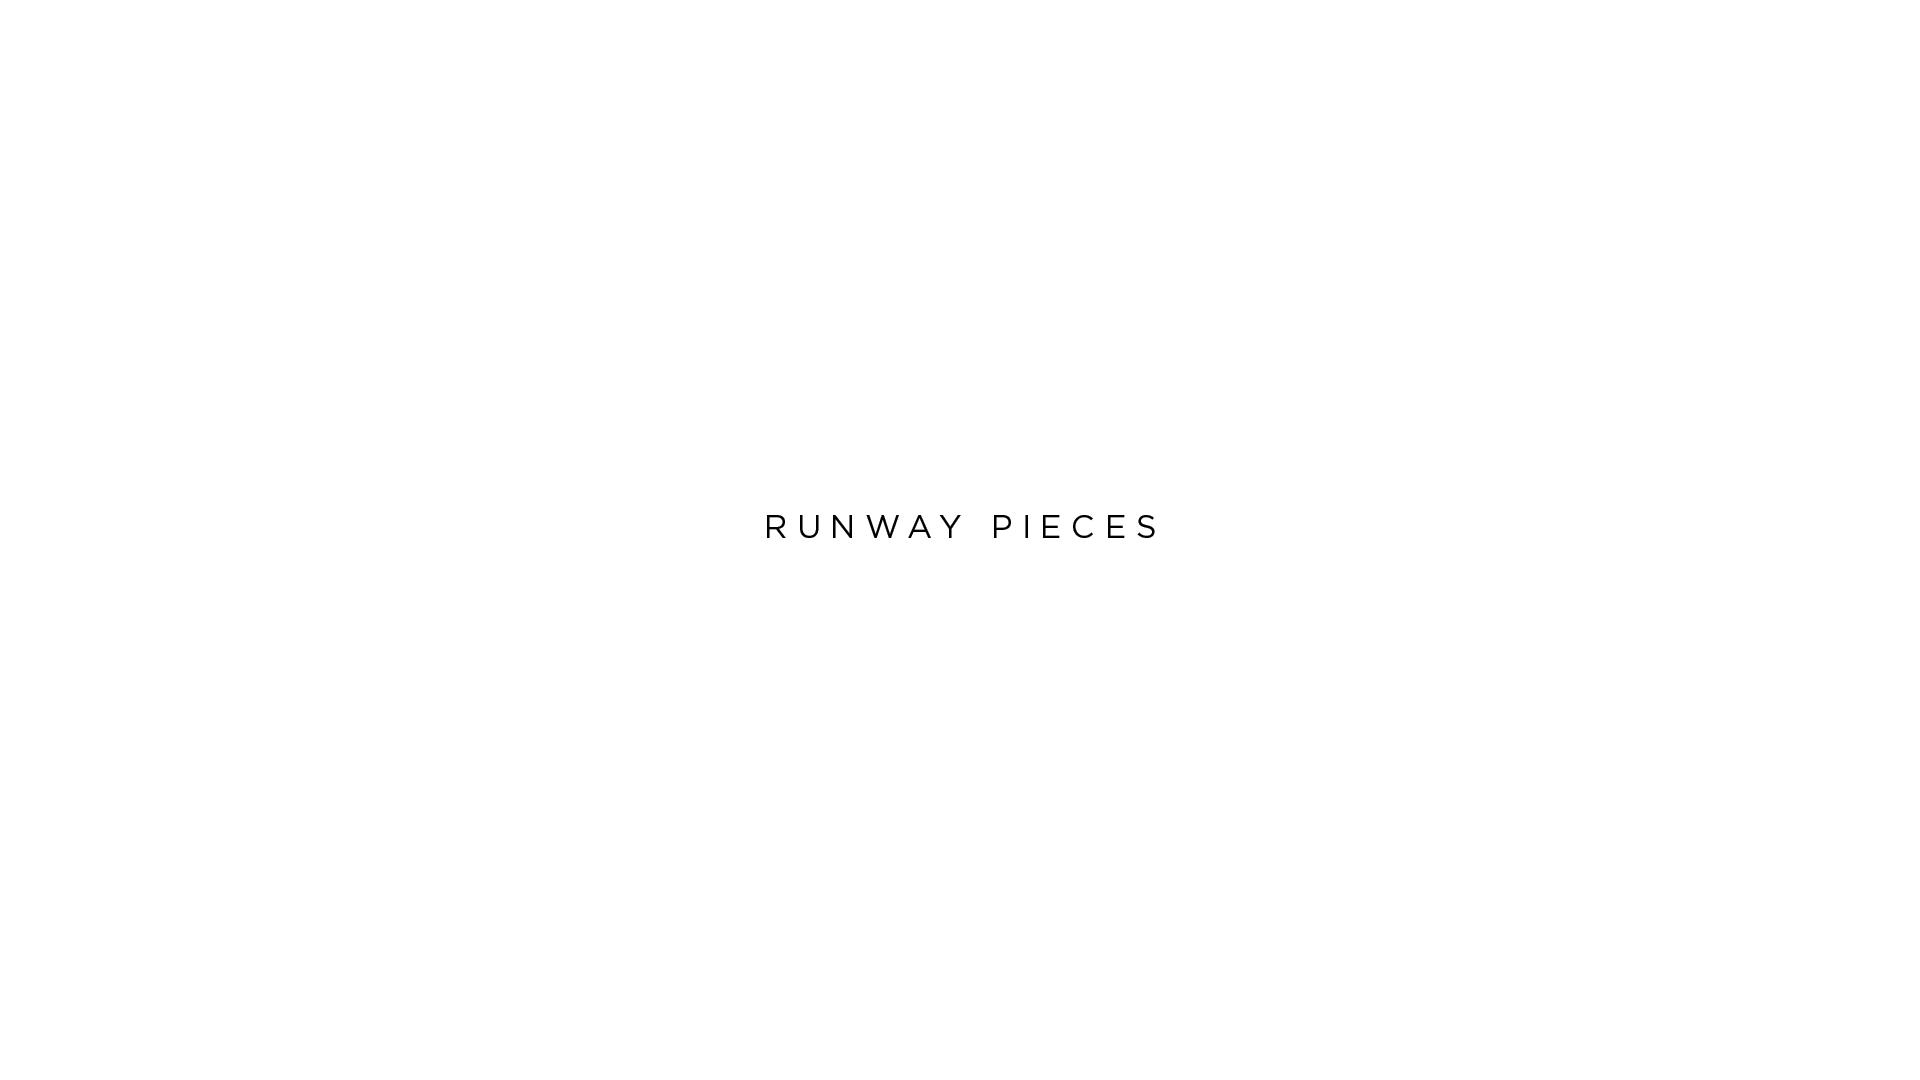 Runway pieces4